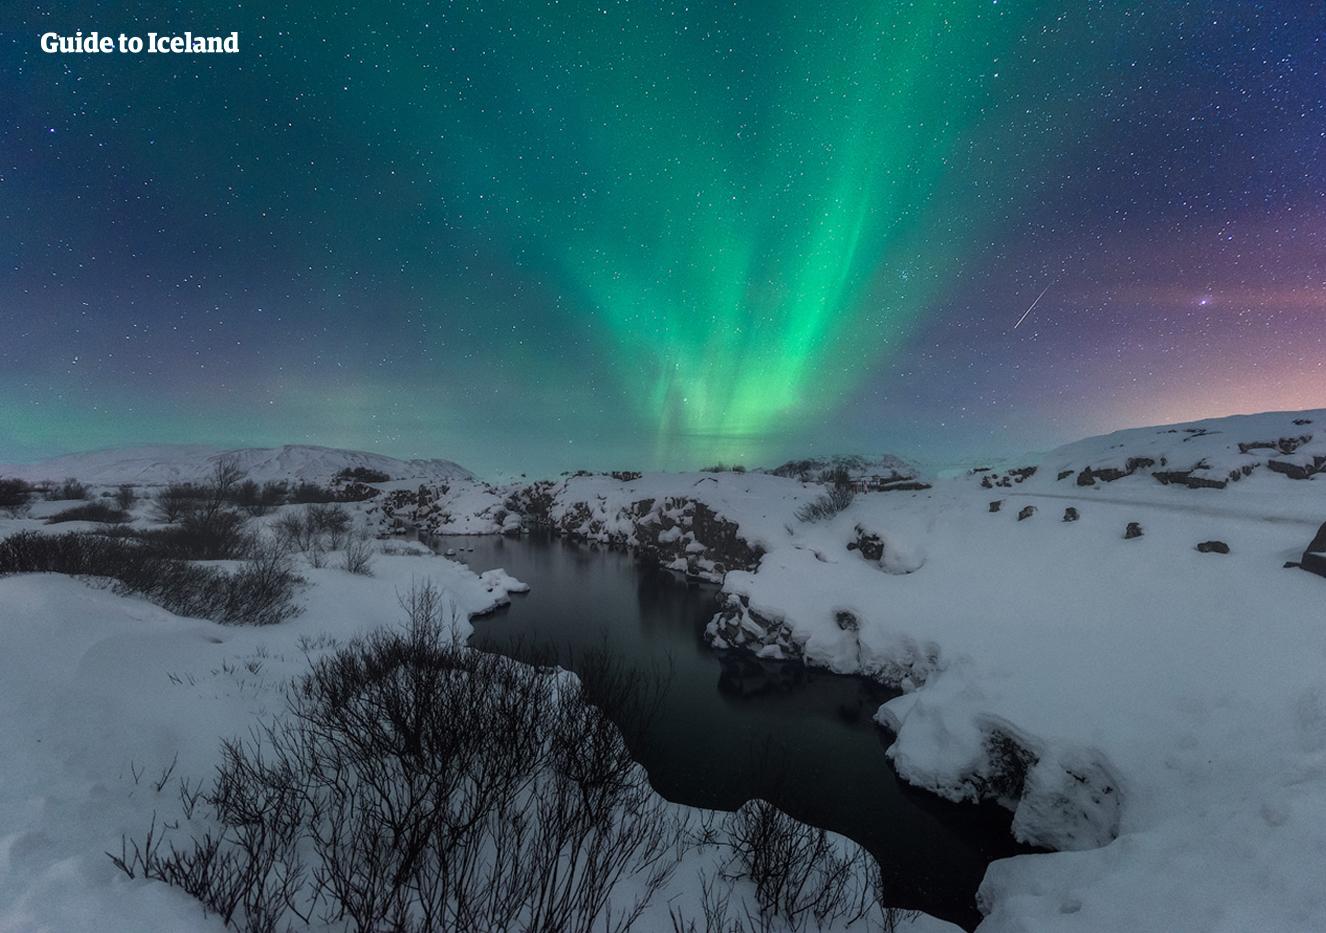 Thingvellir National Park in South West Iceland under a brilliant Aurora-filled sky.